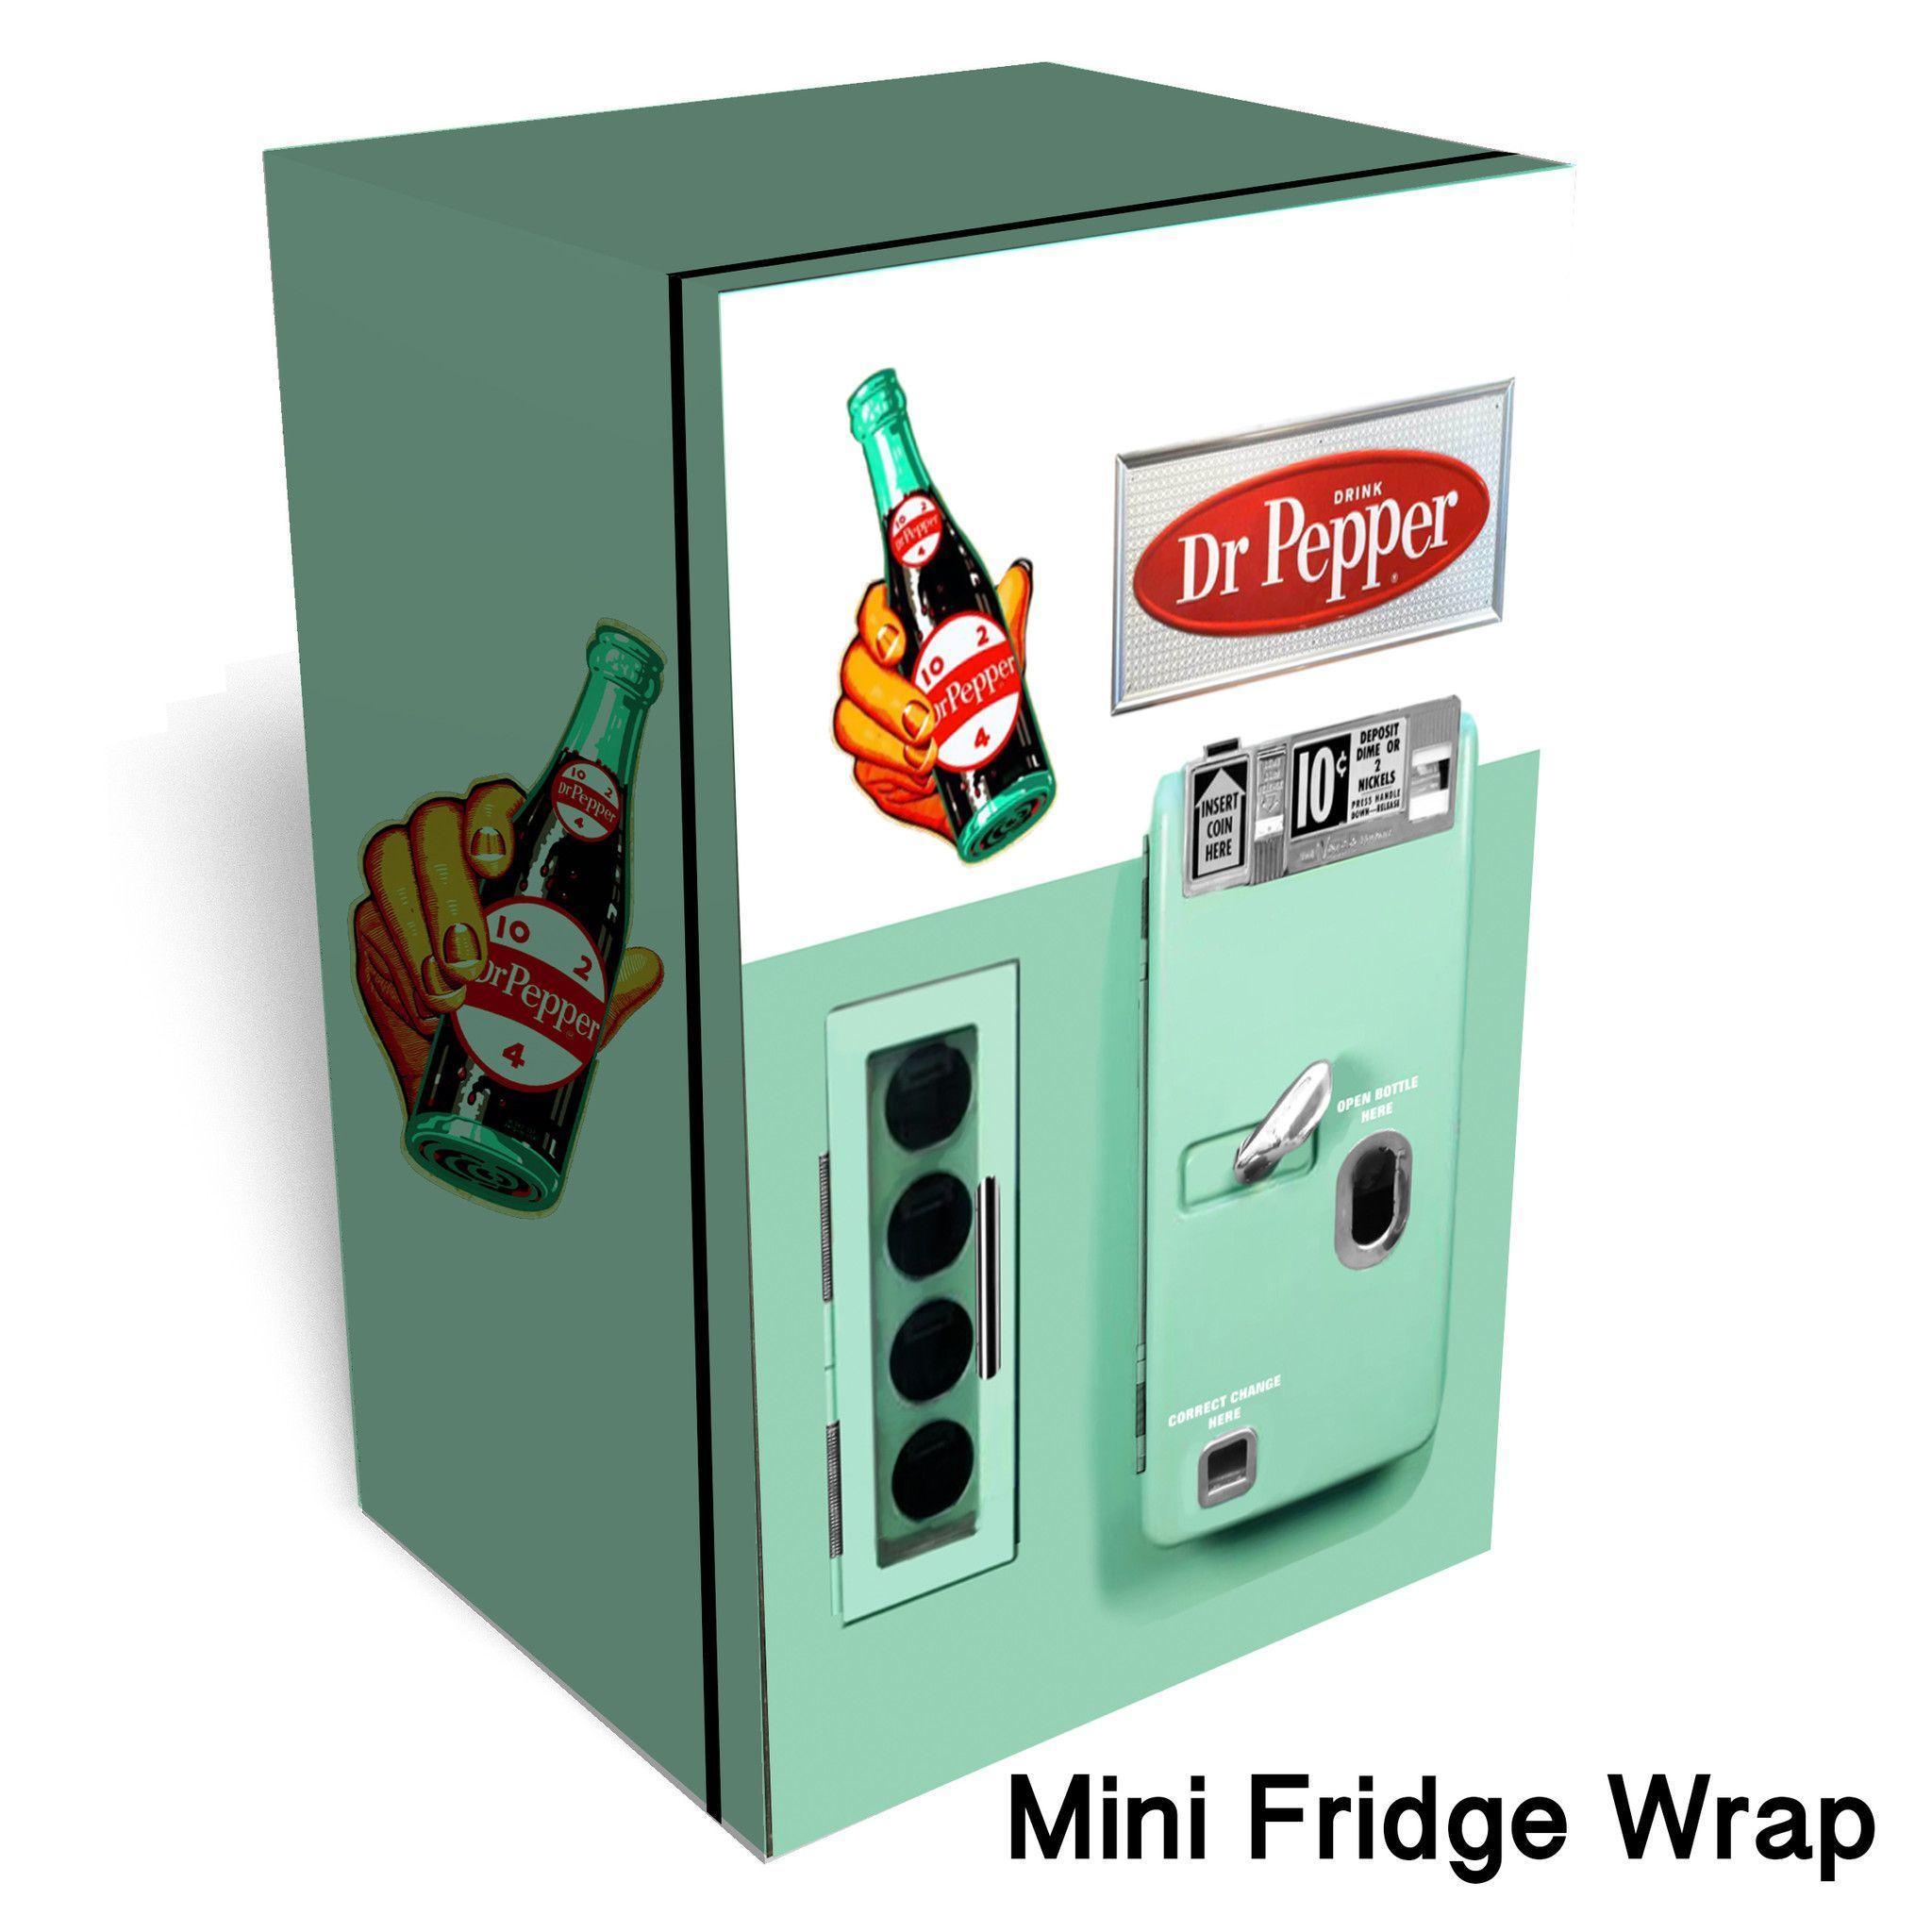 Schön Dr Pepper Vintage Mini Fridge Front Wrap Sticker